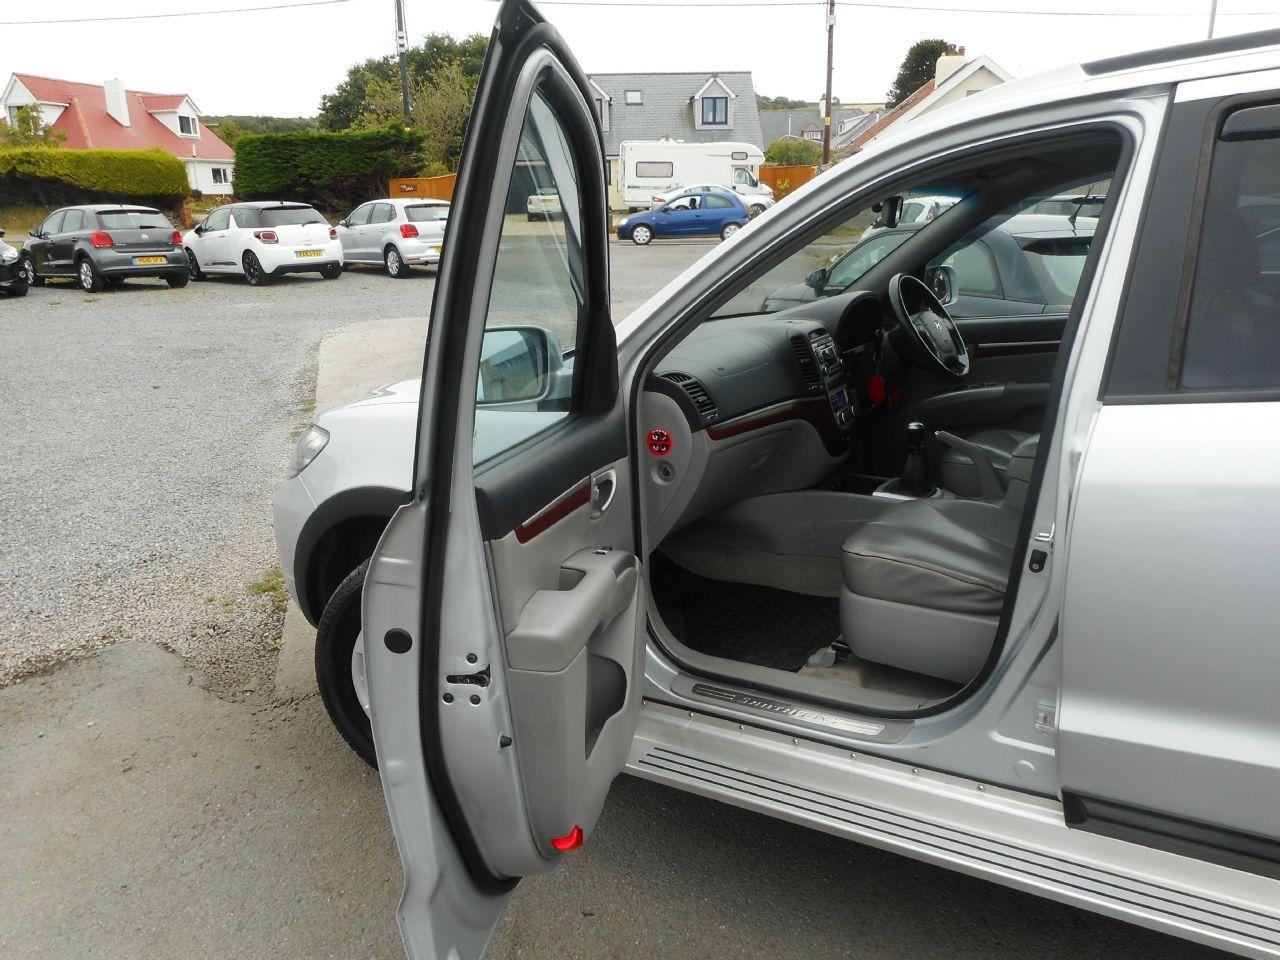 HYUNDAI Santa Fe 2.2 CRTD CDX 5 Seat EU4 (2008) - Picture 12